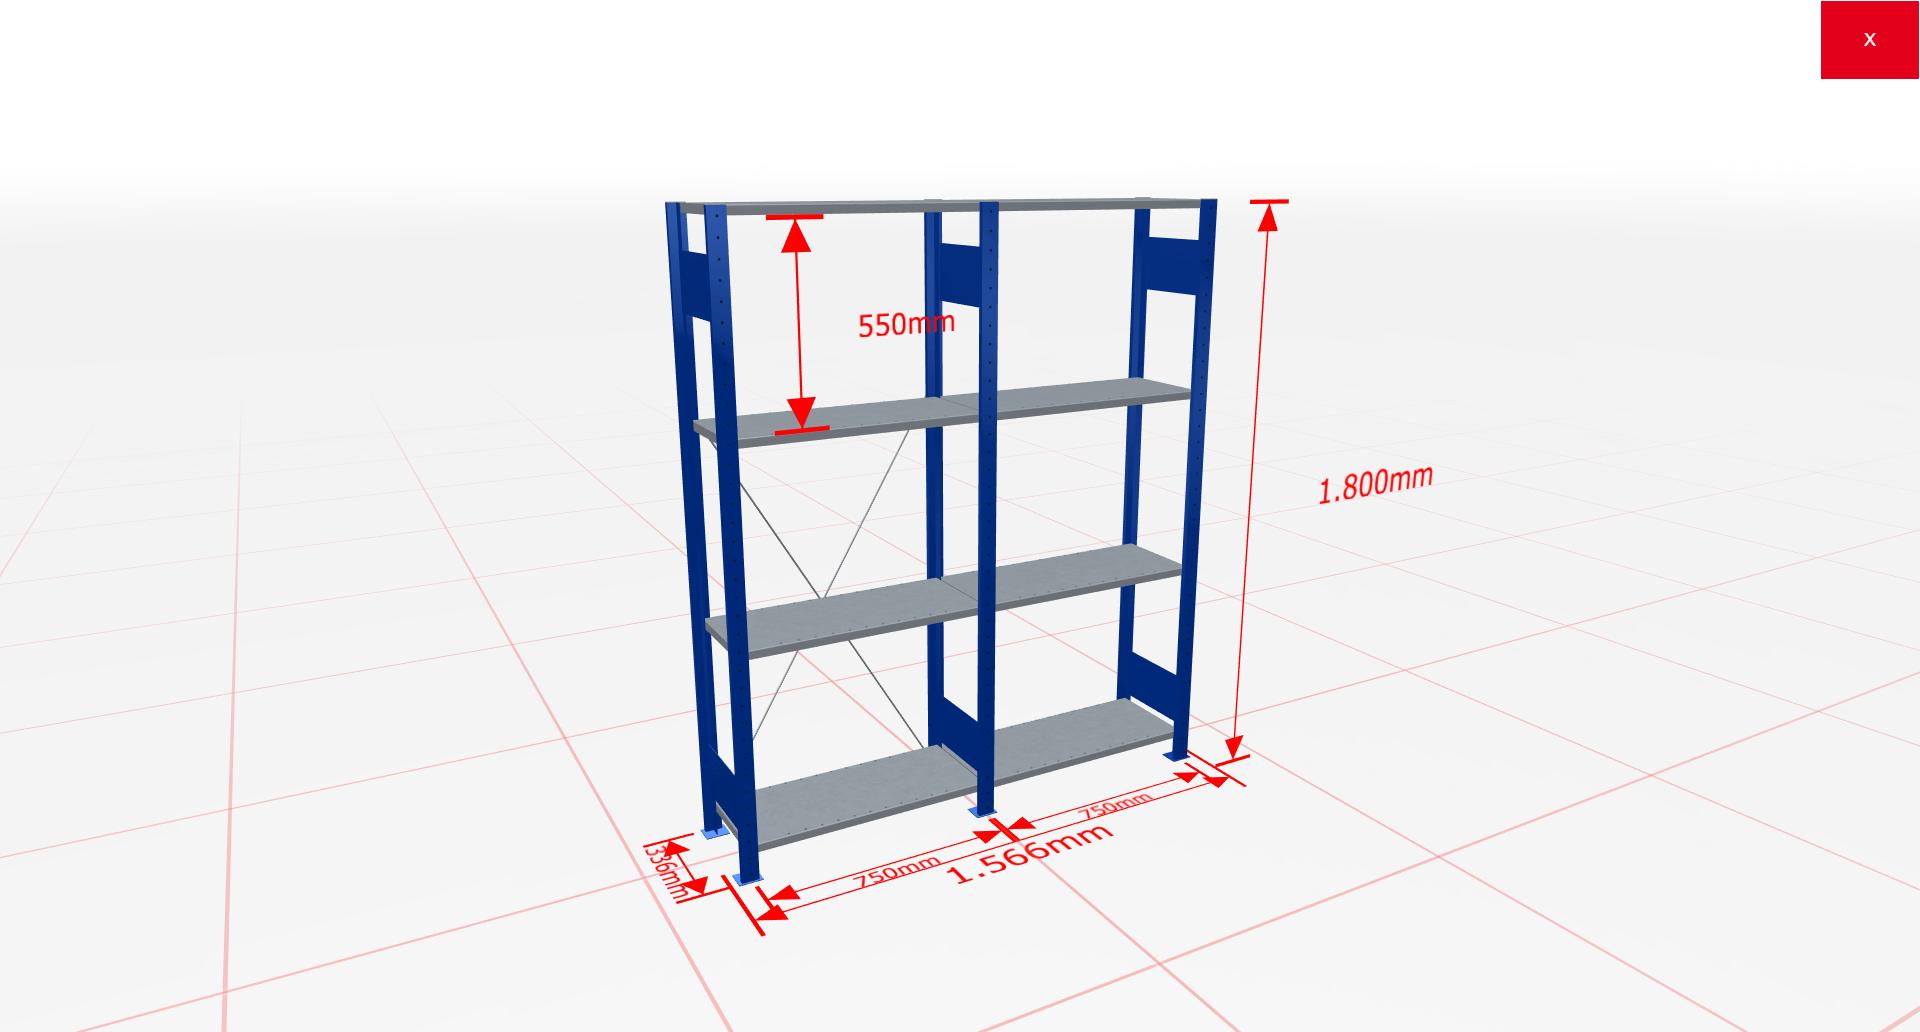 Fachbodenregal Komplettregal 1800x1566x300 mm (HxBxT) SCHULTE Lagertechnik blau 4 Ebenen  150 kg je Boden